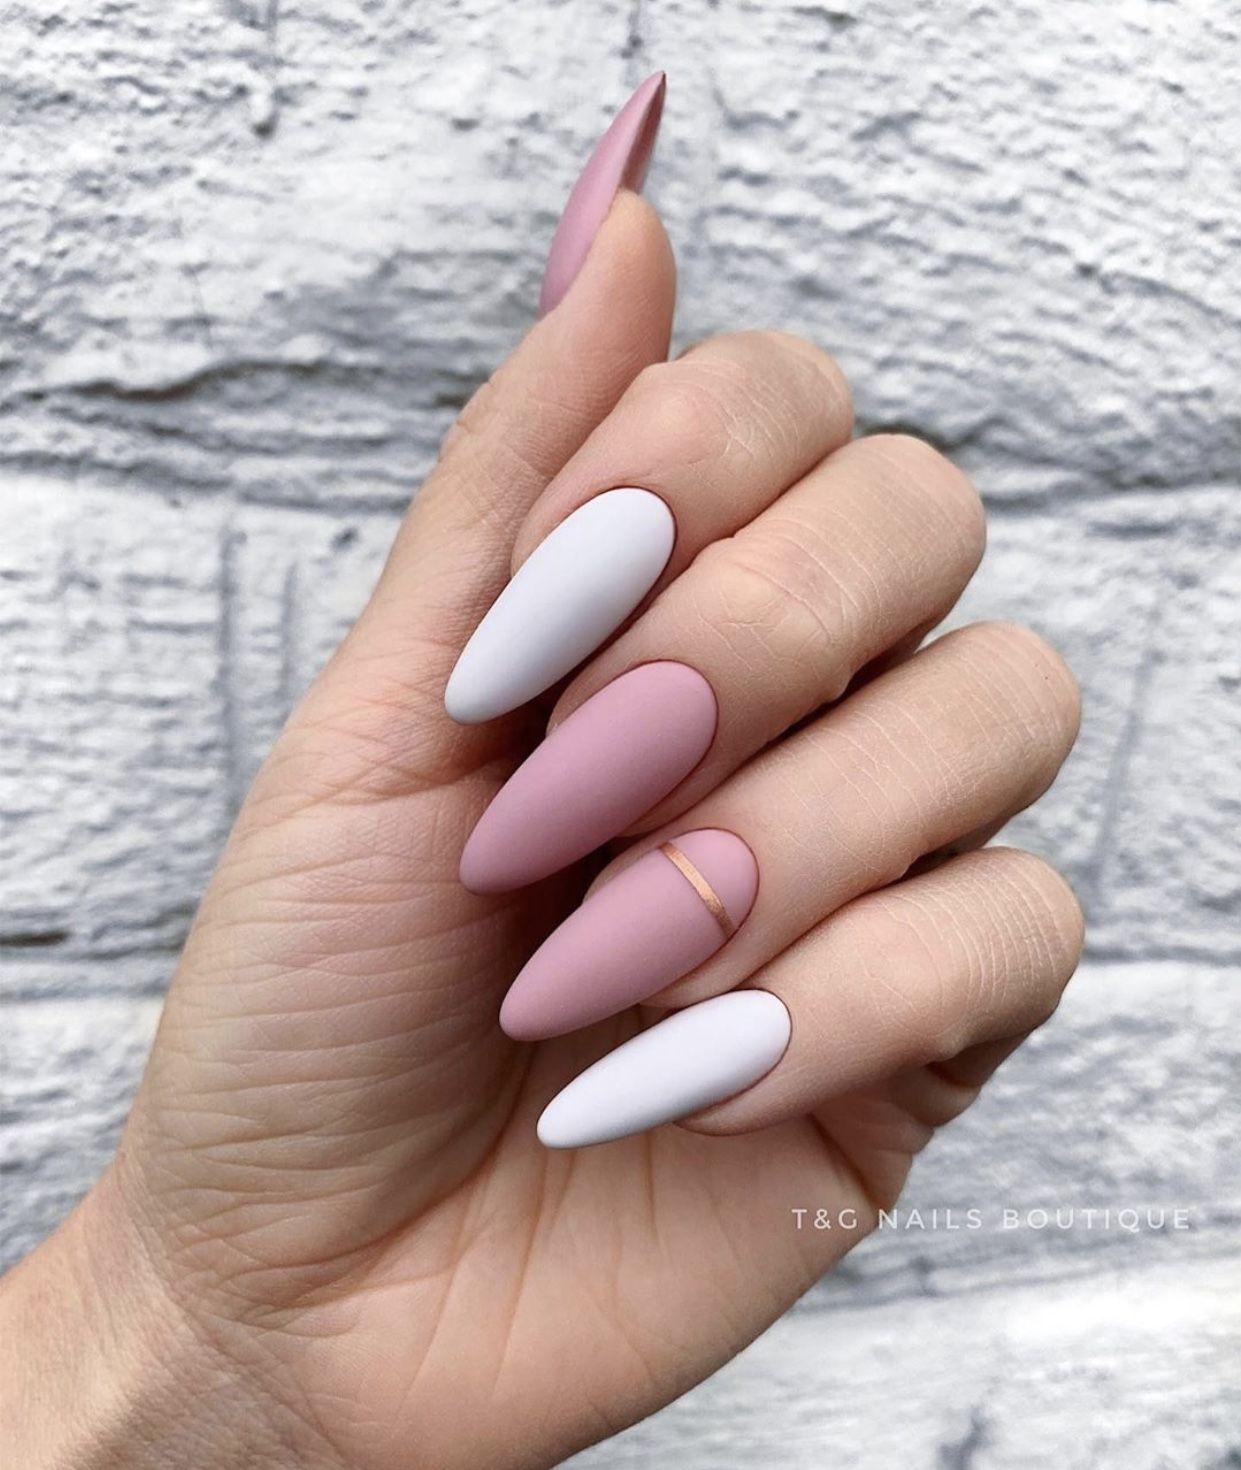 Pin By Nicole Horka On Nails In 2020 Matne Nehty Gelove Nehty Design Nehtu